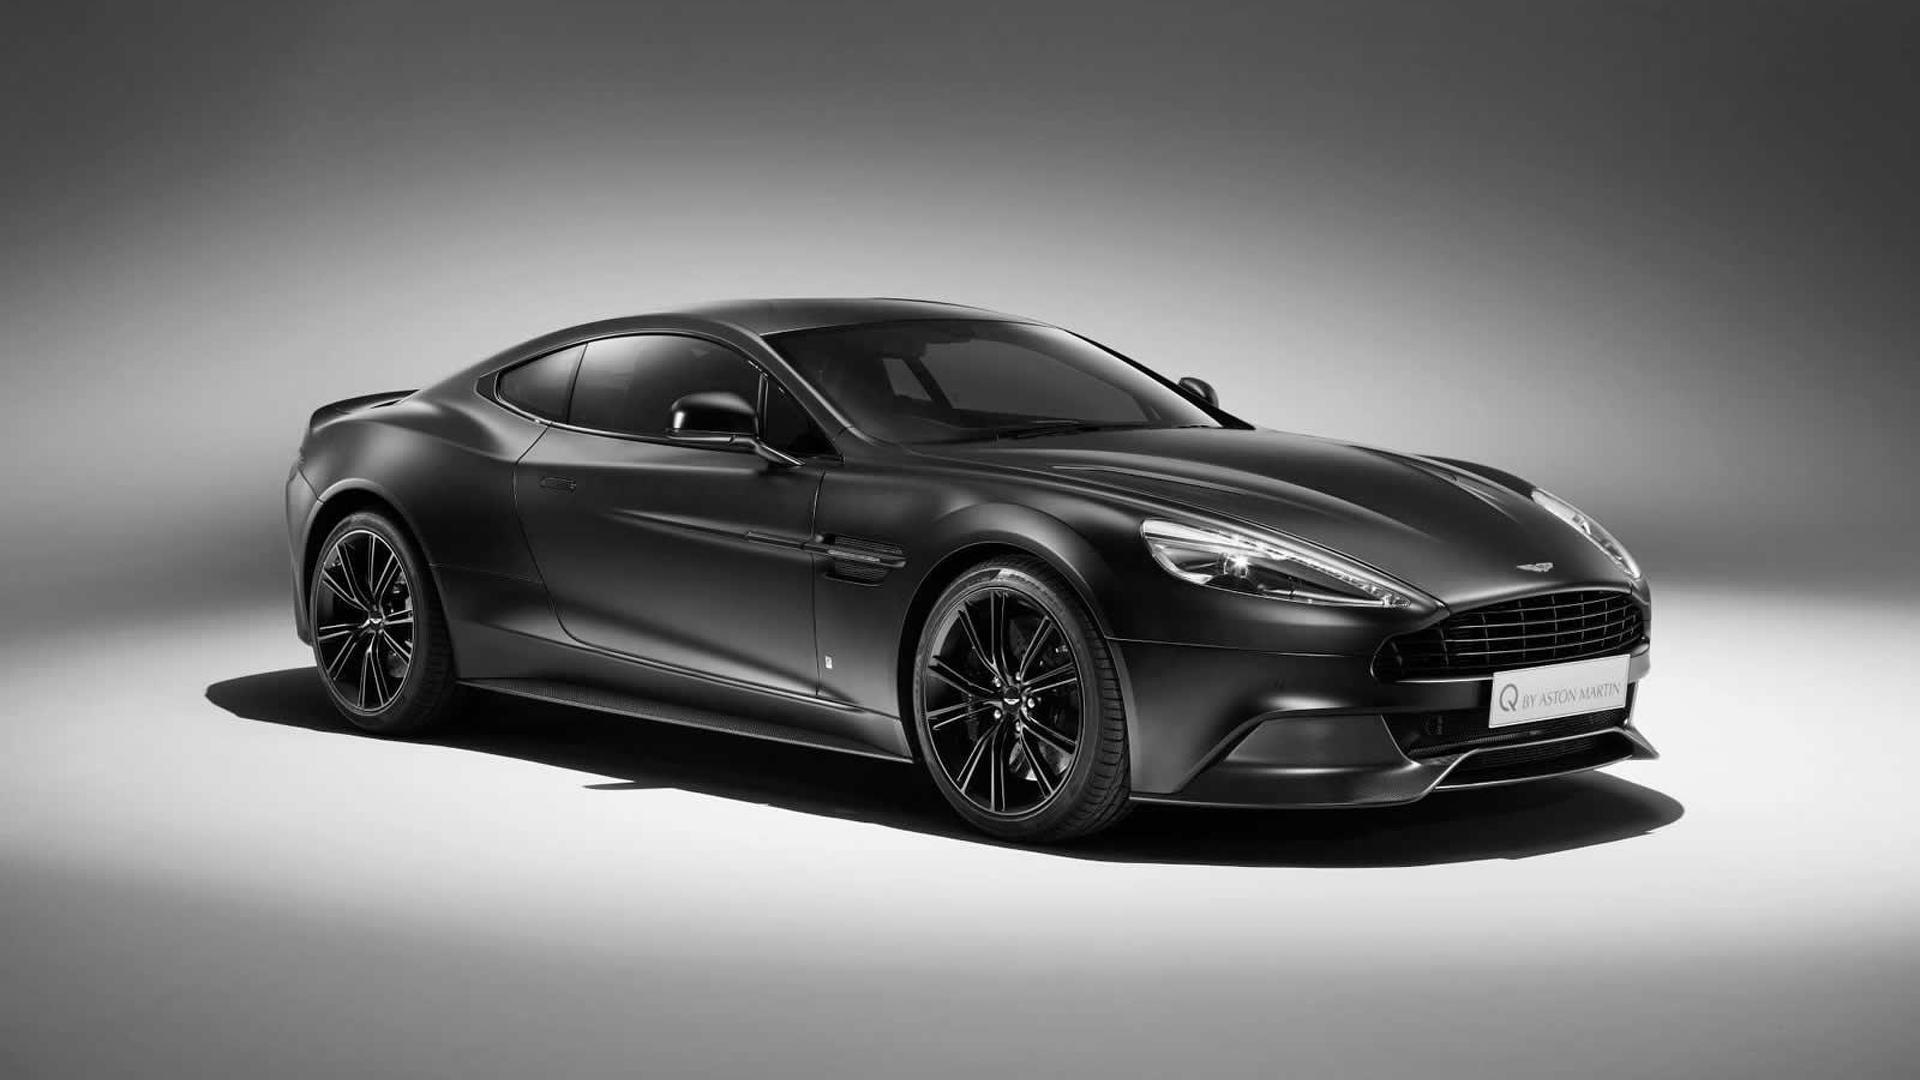 Aston Martin Vantage Vanquish Replacements Coming By - 2018 aston martin vanquish coupe